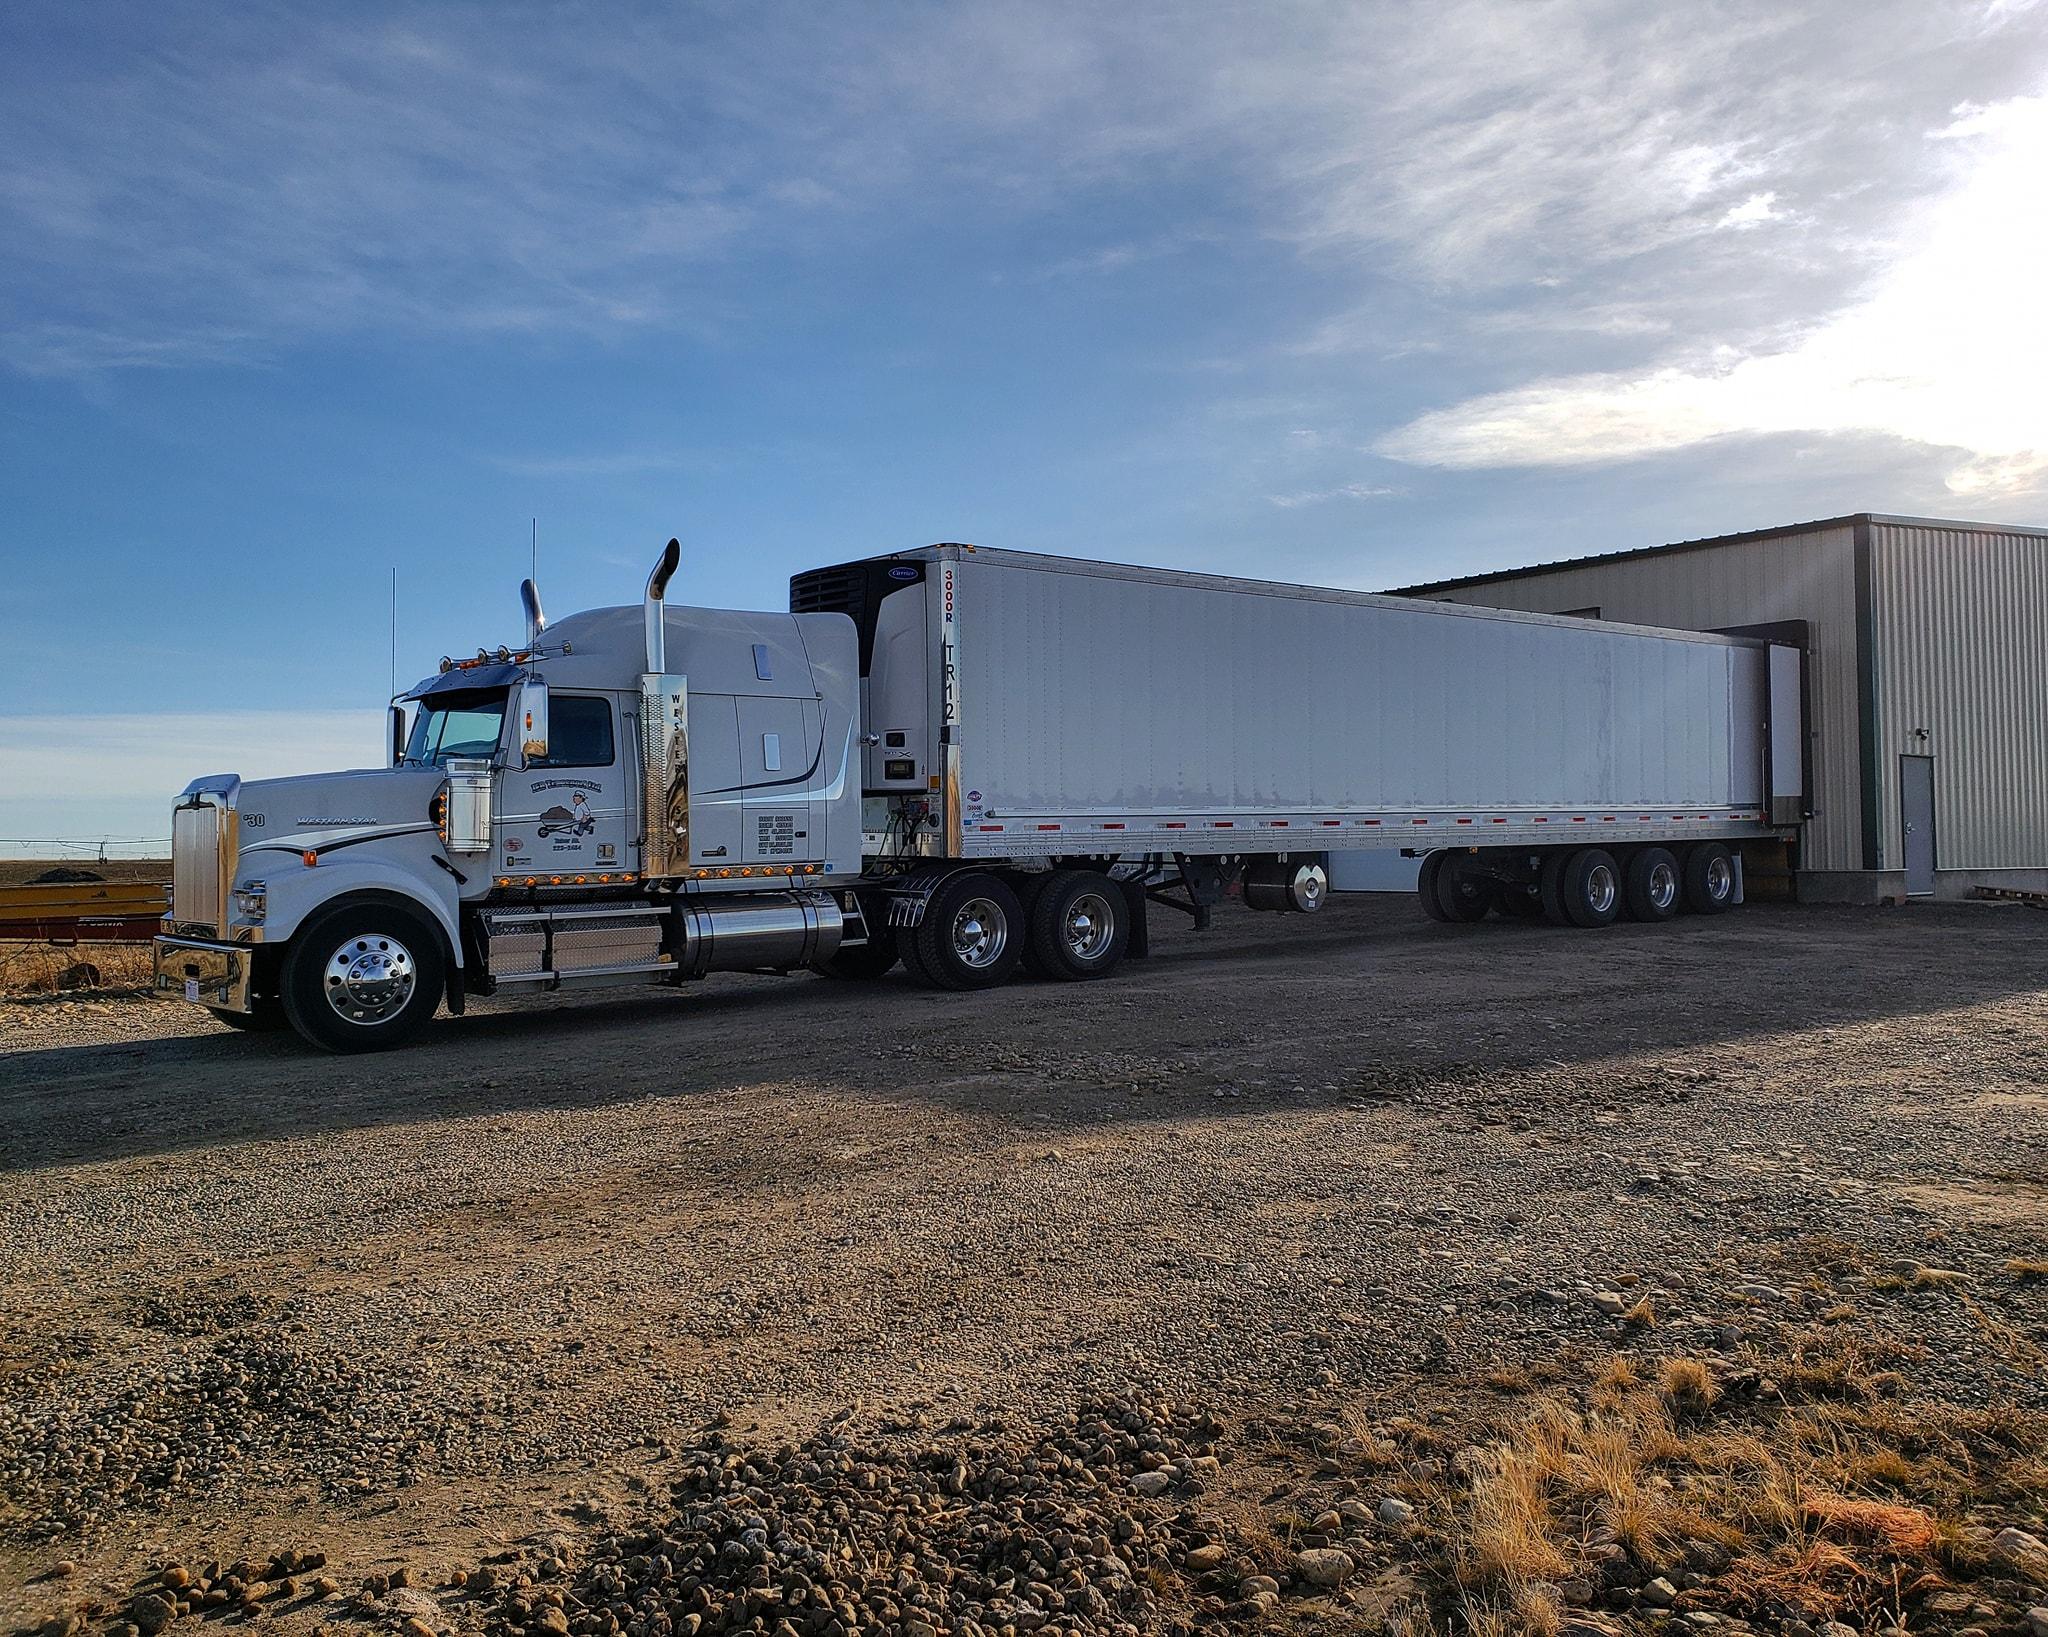 Dirk-Pieter-Verbeek-reis-naar-Idaho-13-1-2019--1